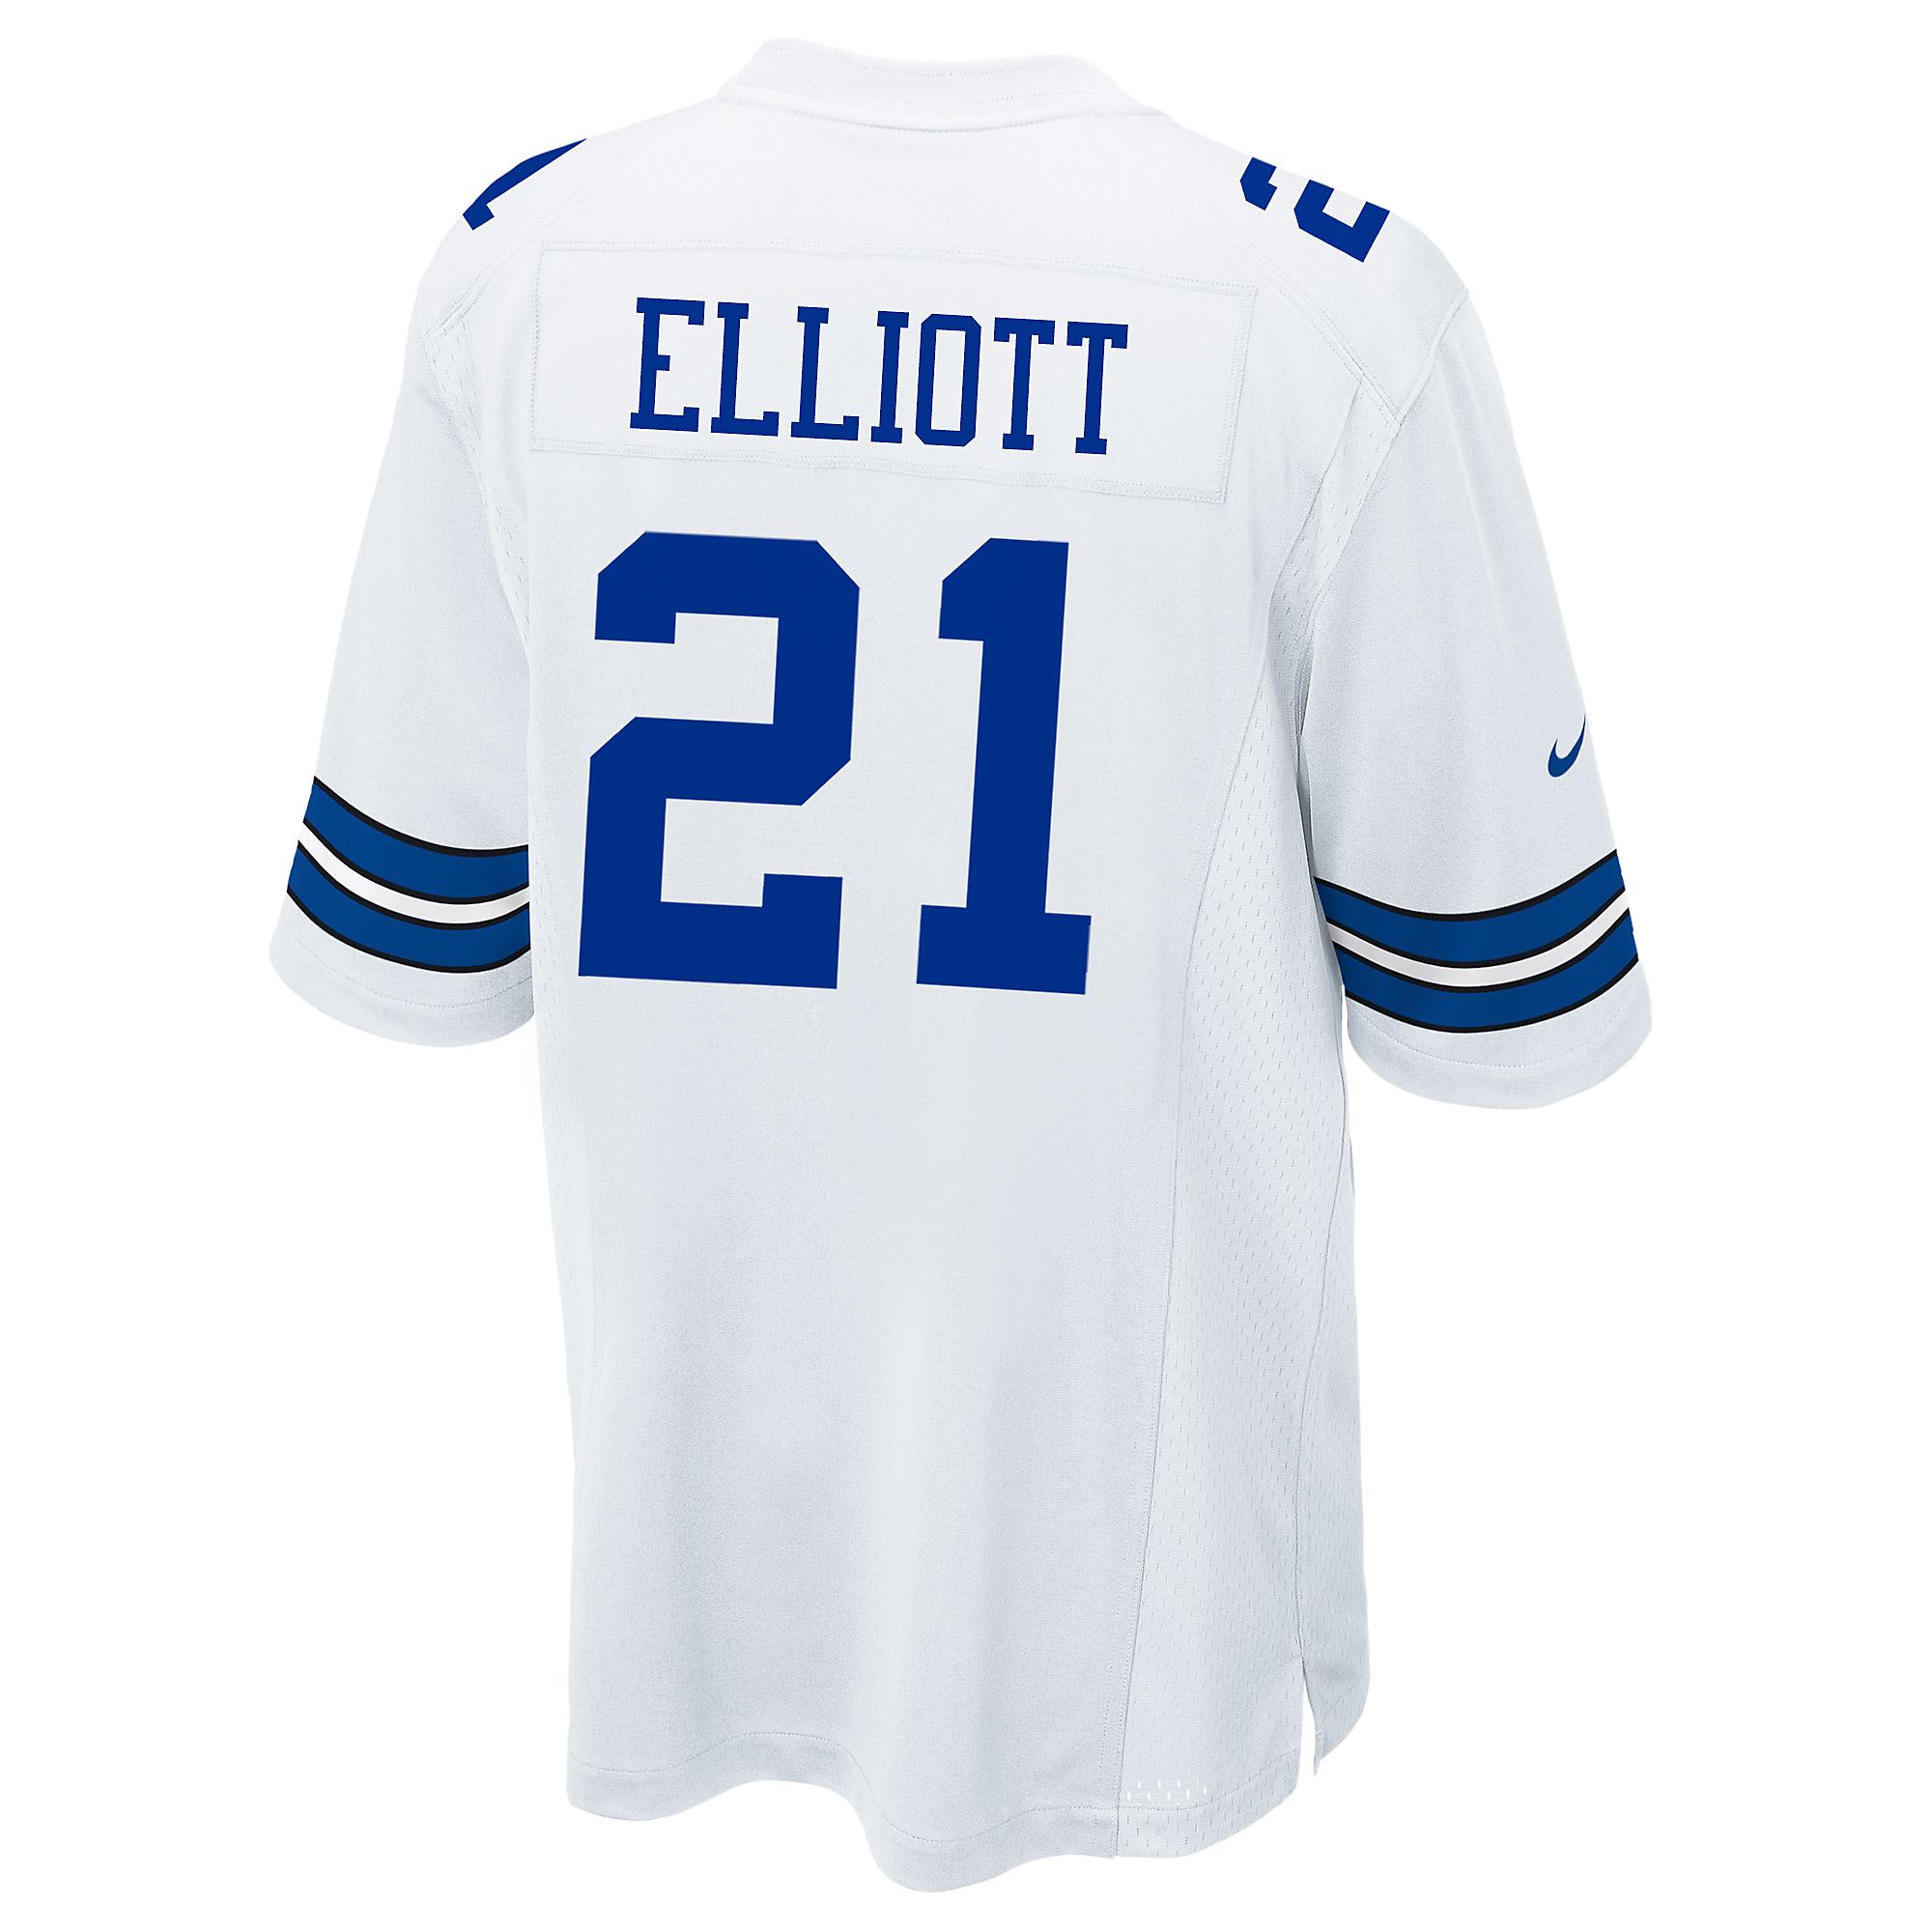 Dallas Cowboys Ezekiel Elliott #21 Nike White Game Replica Jersey